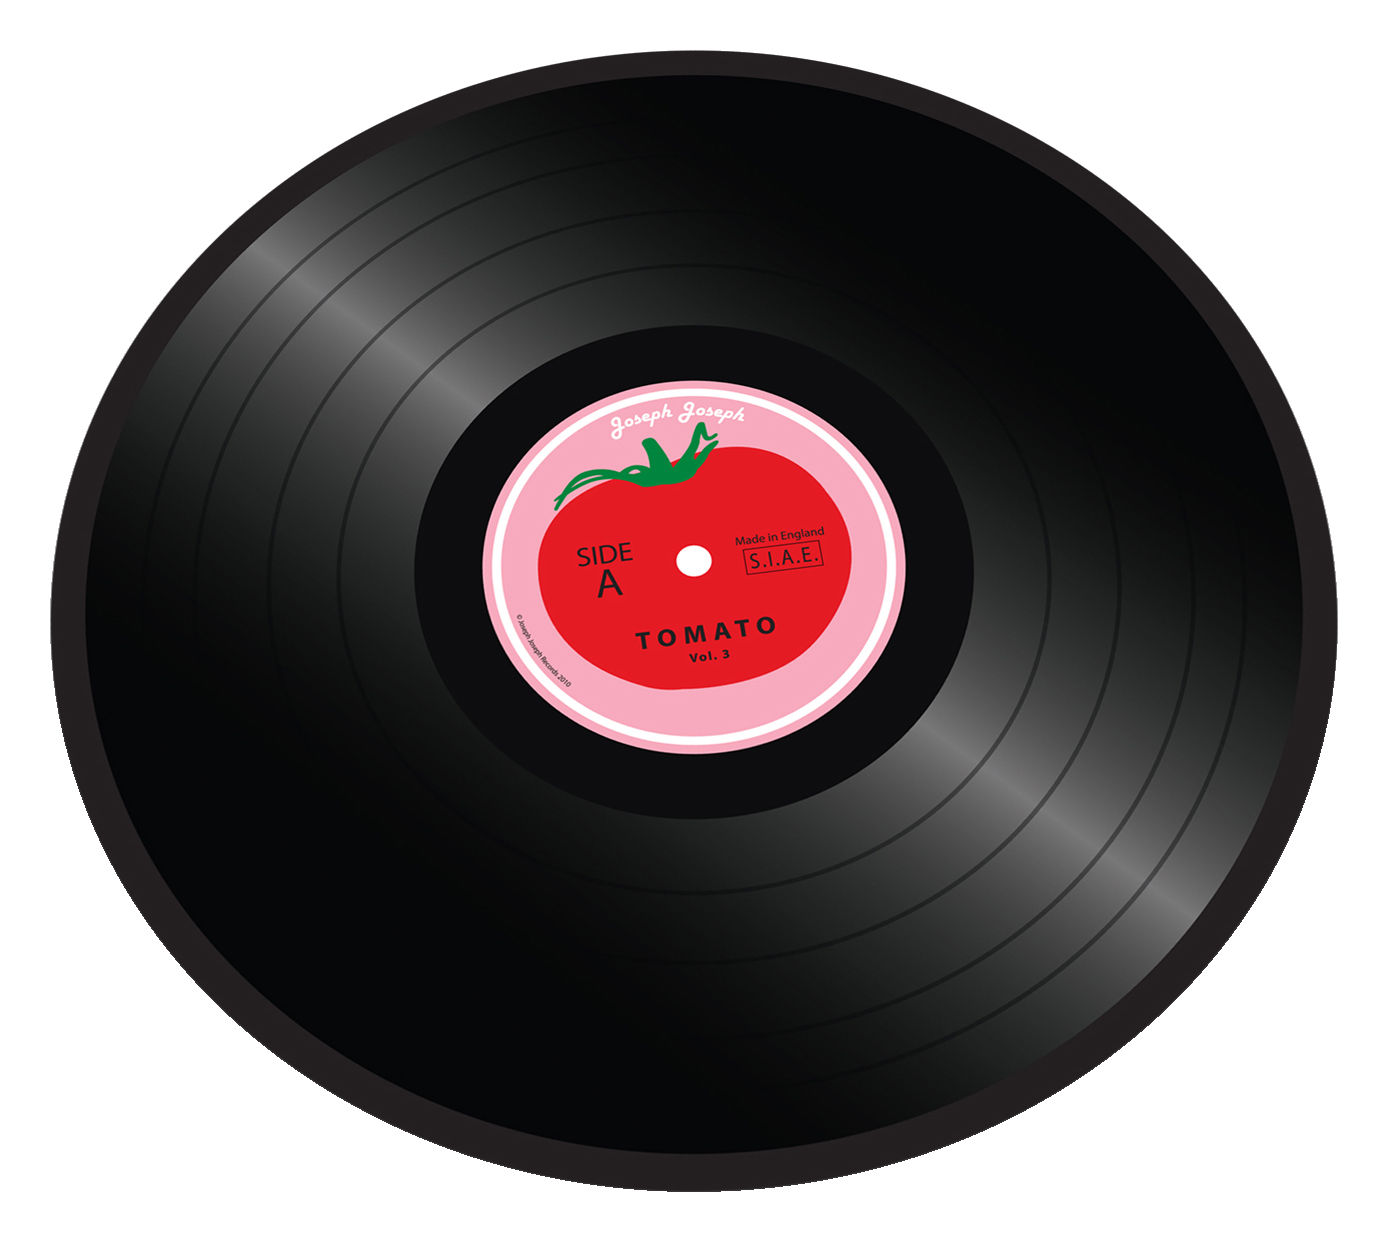 Tavola - Vassoi  - Tagliere Tomato vinyl - / sottopiatto di Joseph Joseph - Tomato Vinyl - Vetro